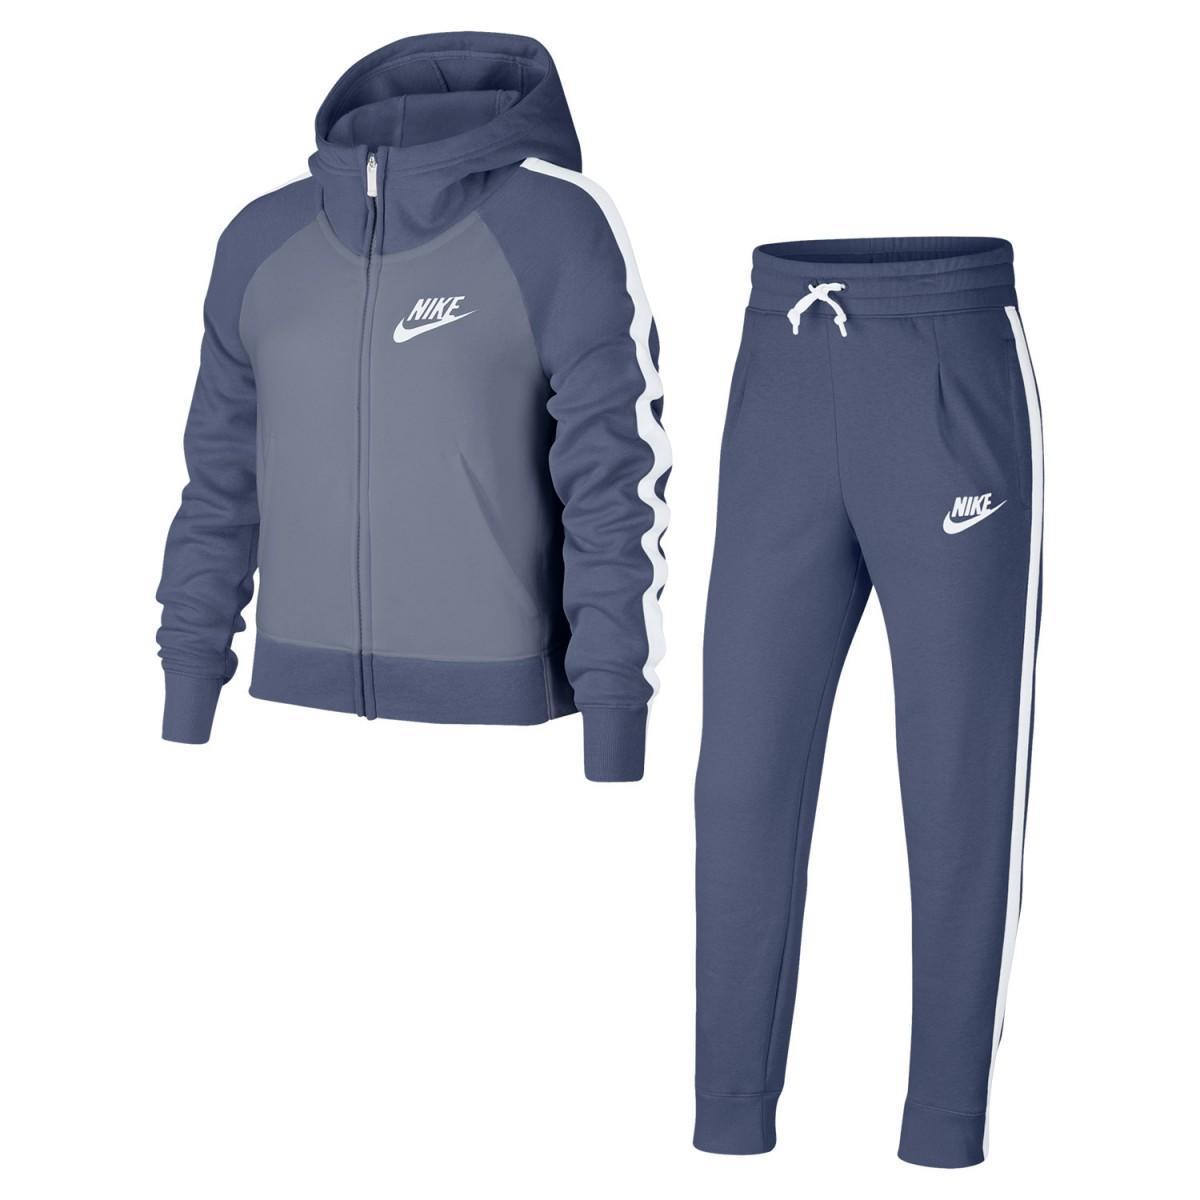 Спортивный костюм детский Nike Girl's Sportswear Suit Blue